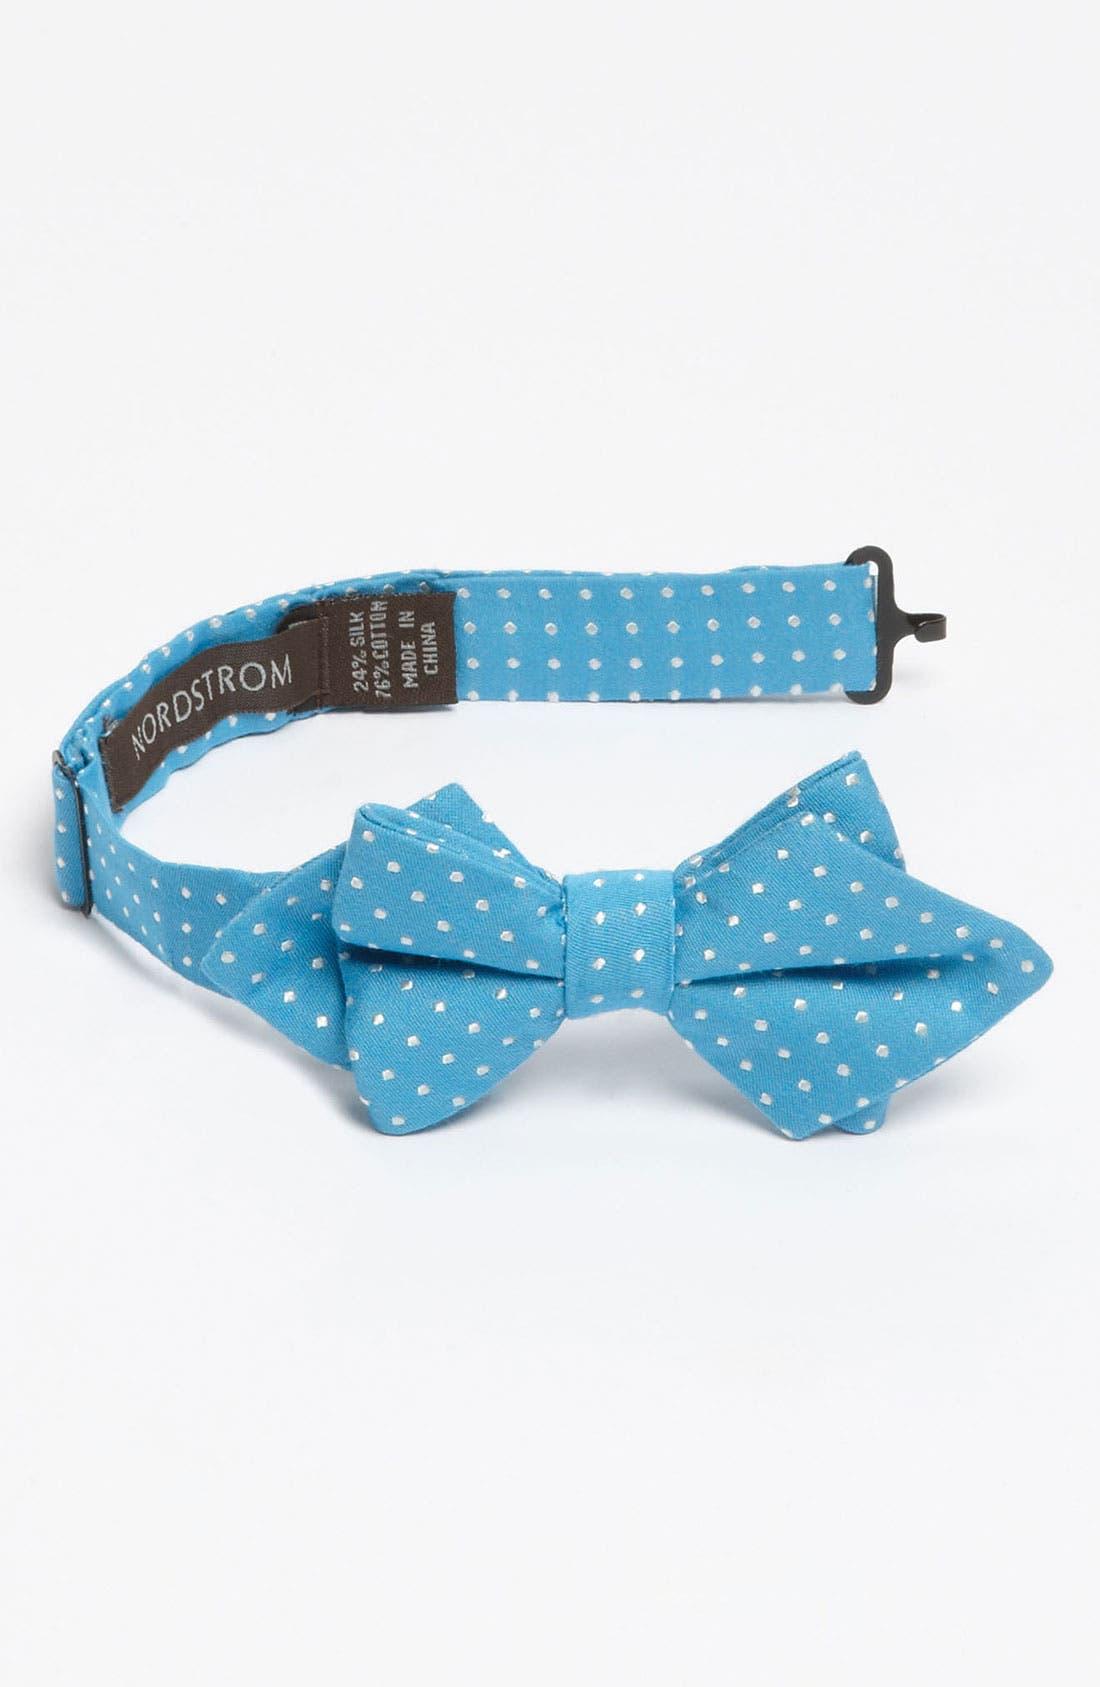 Main Image - Nordstrom Cotton Blend Bow Tie (Little Boys)